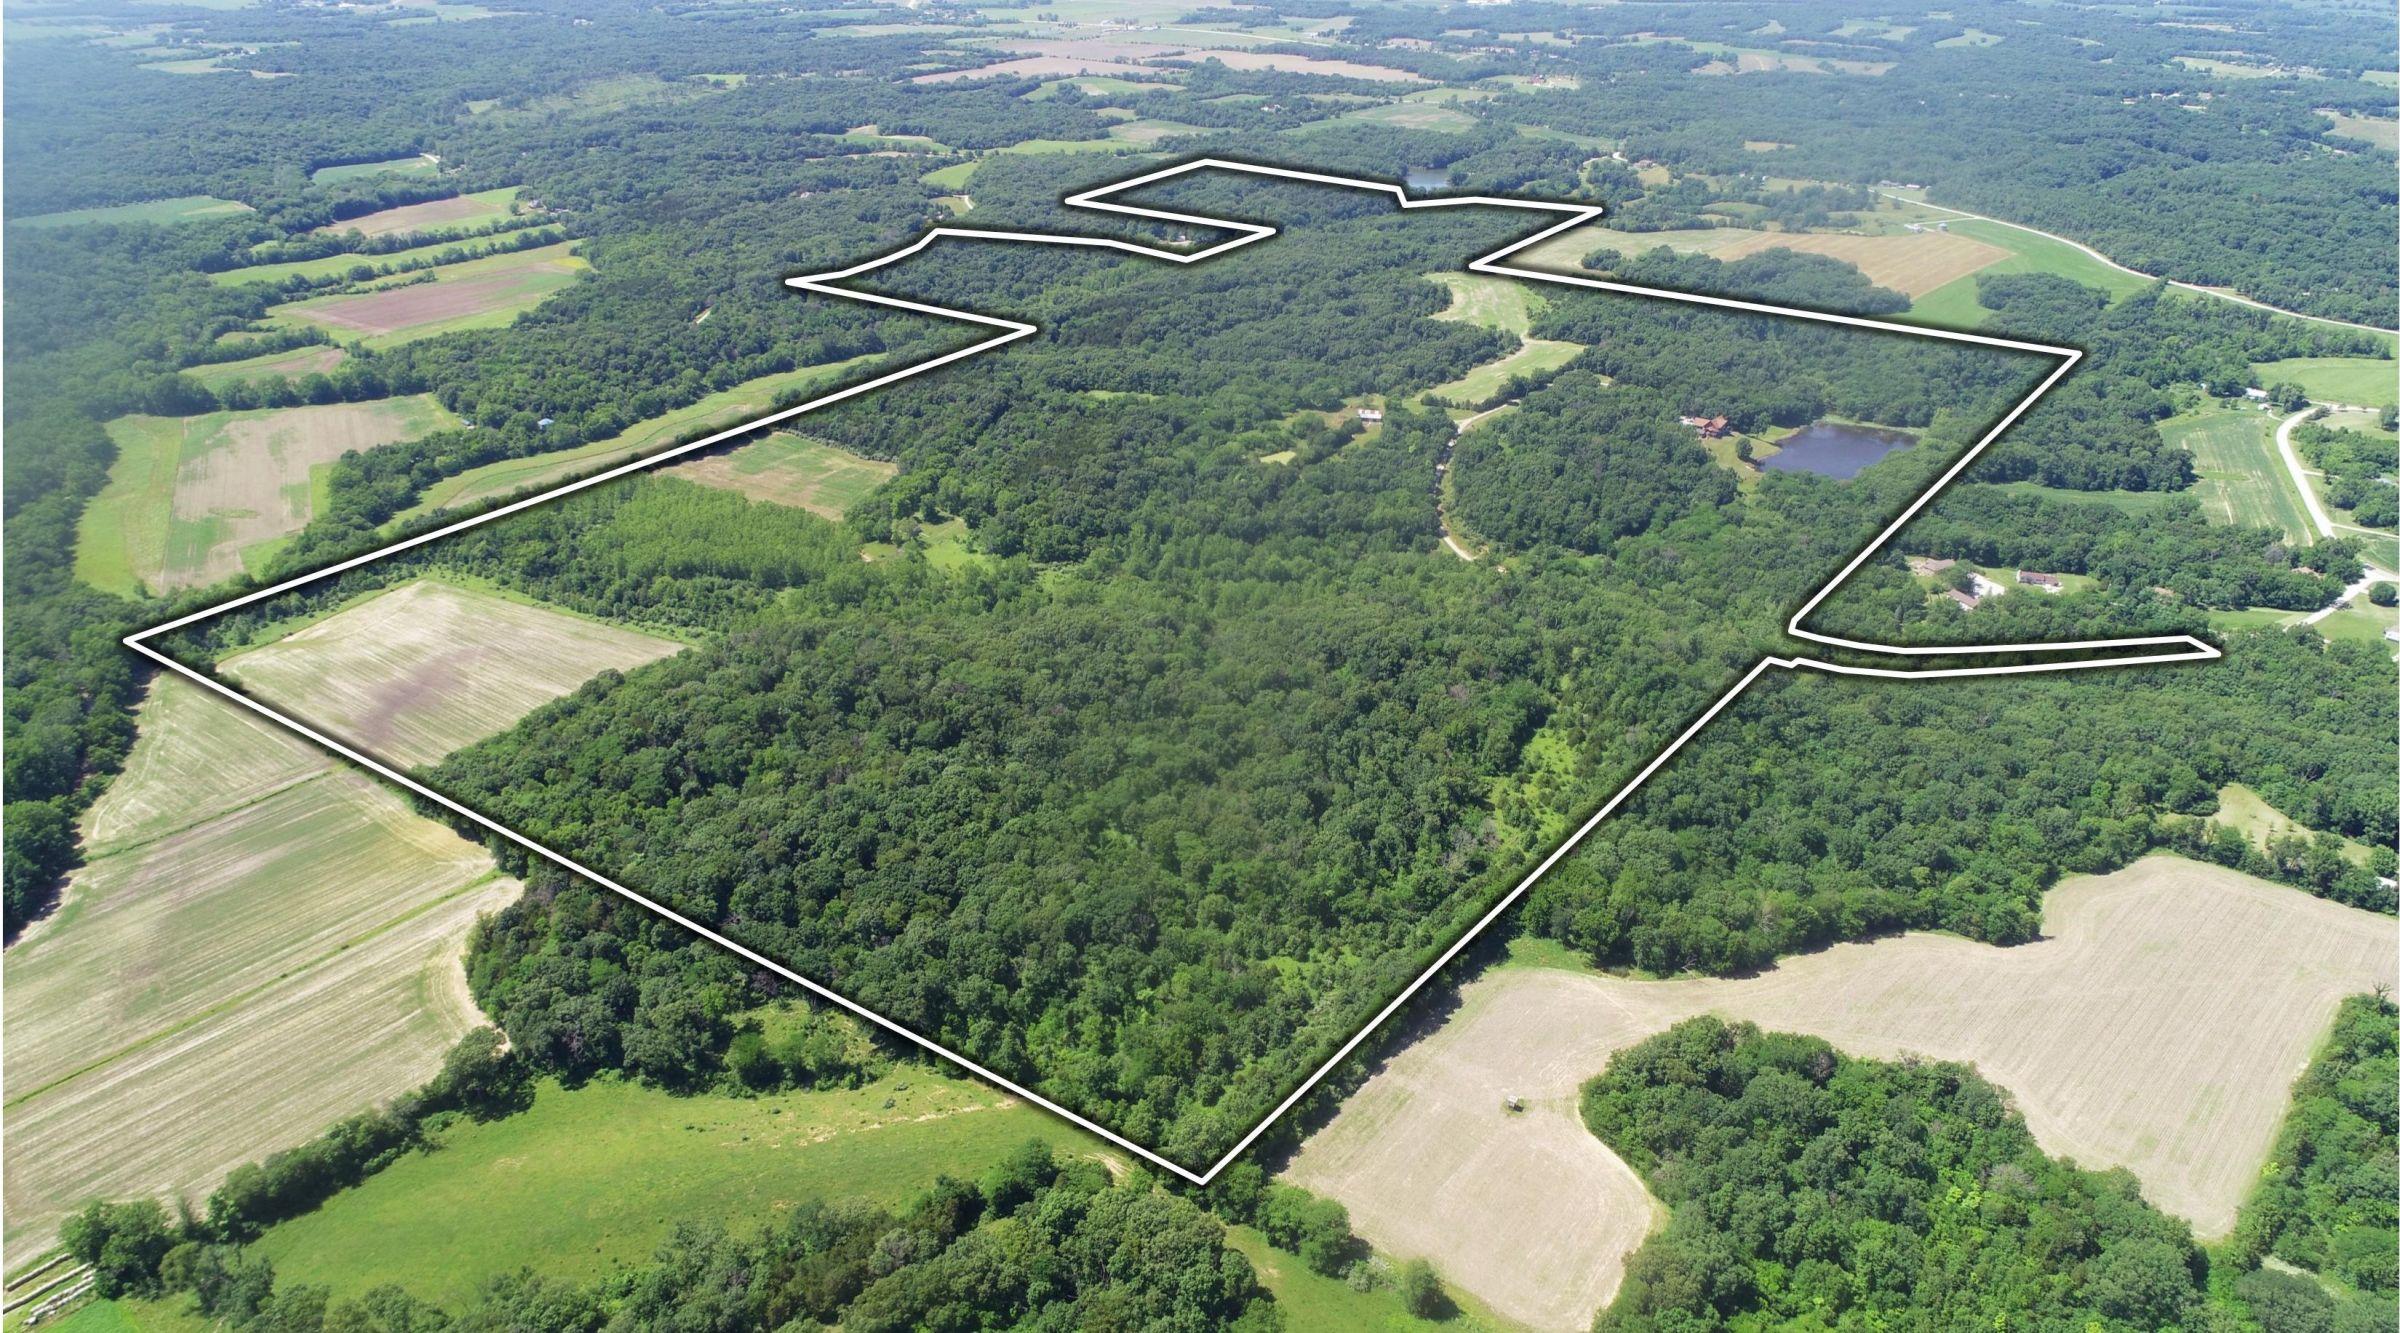 land-lee-county-iowa-328-acres-listing-number-15137-3-2020-08-27-175145.jpg